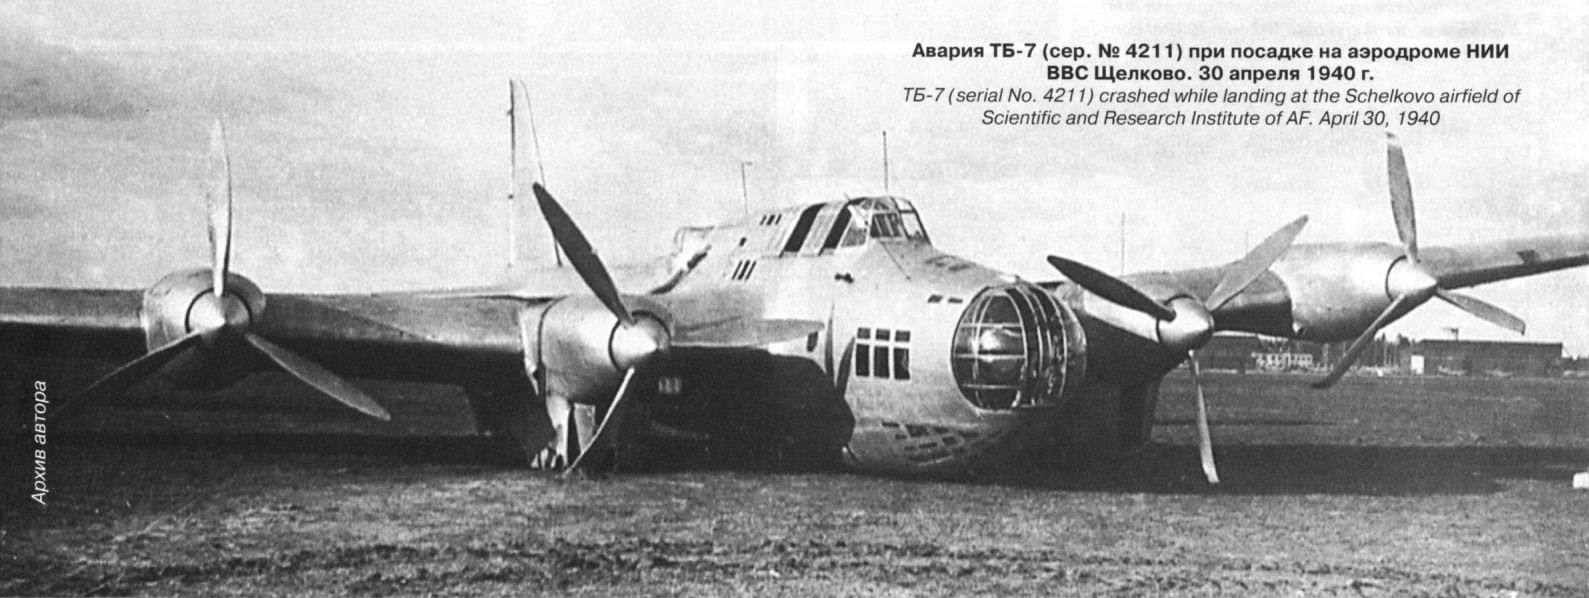 фото самолёт пе-8